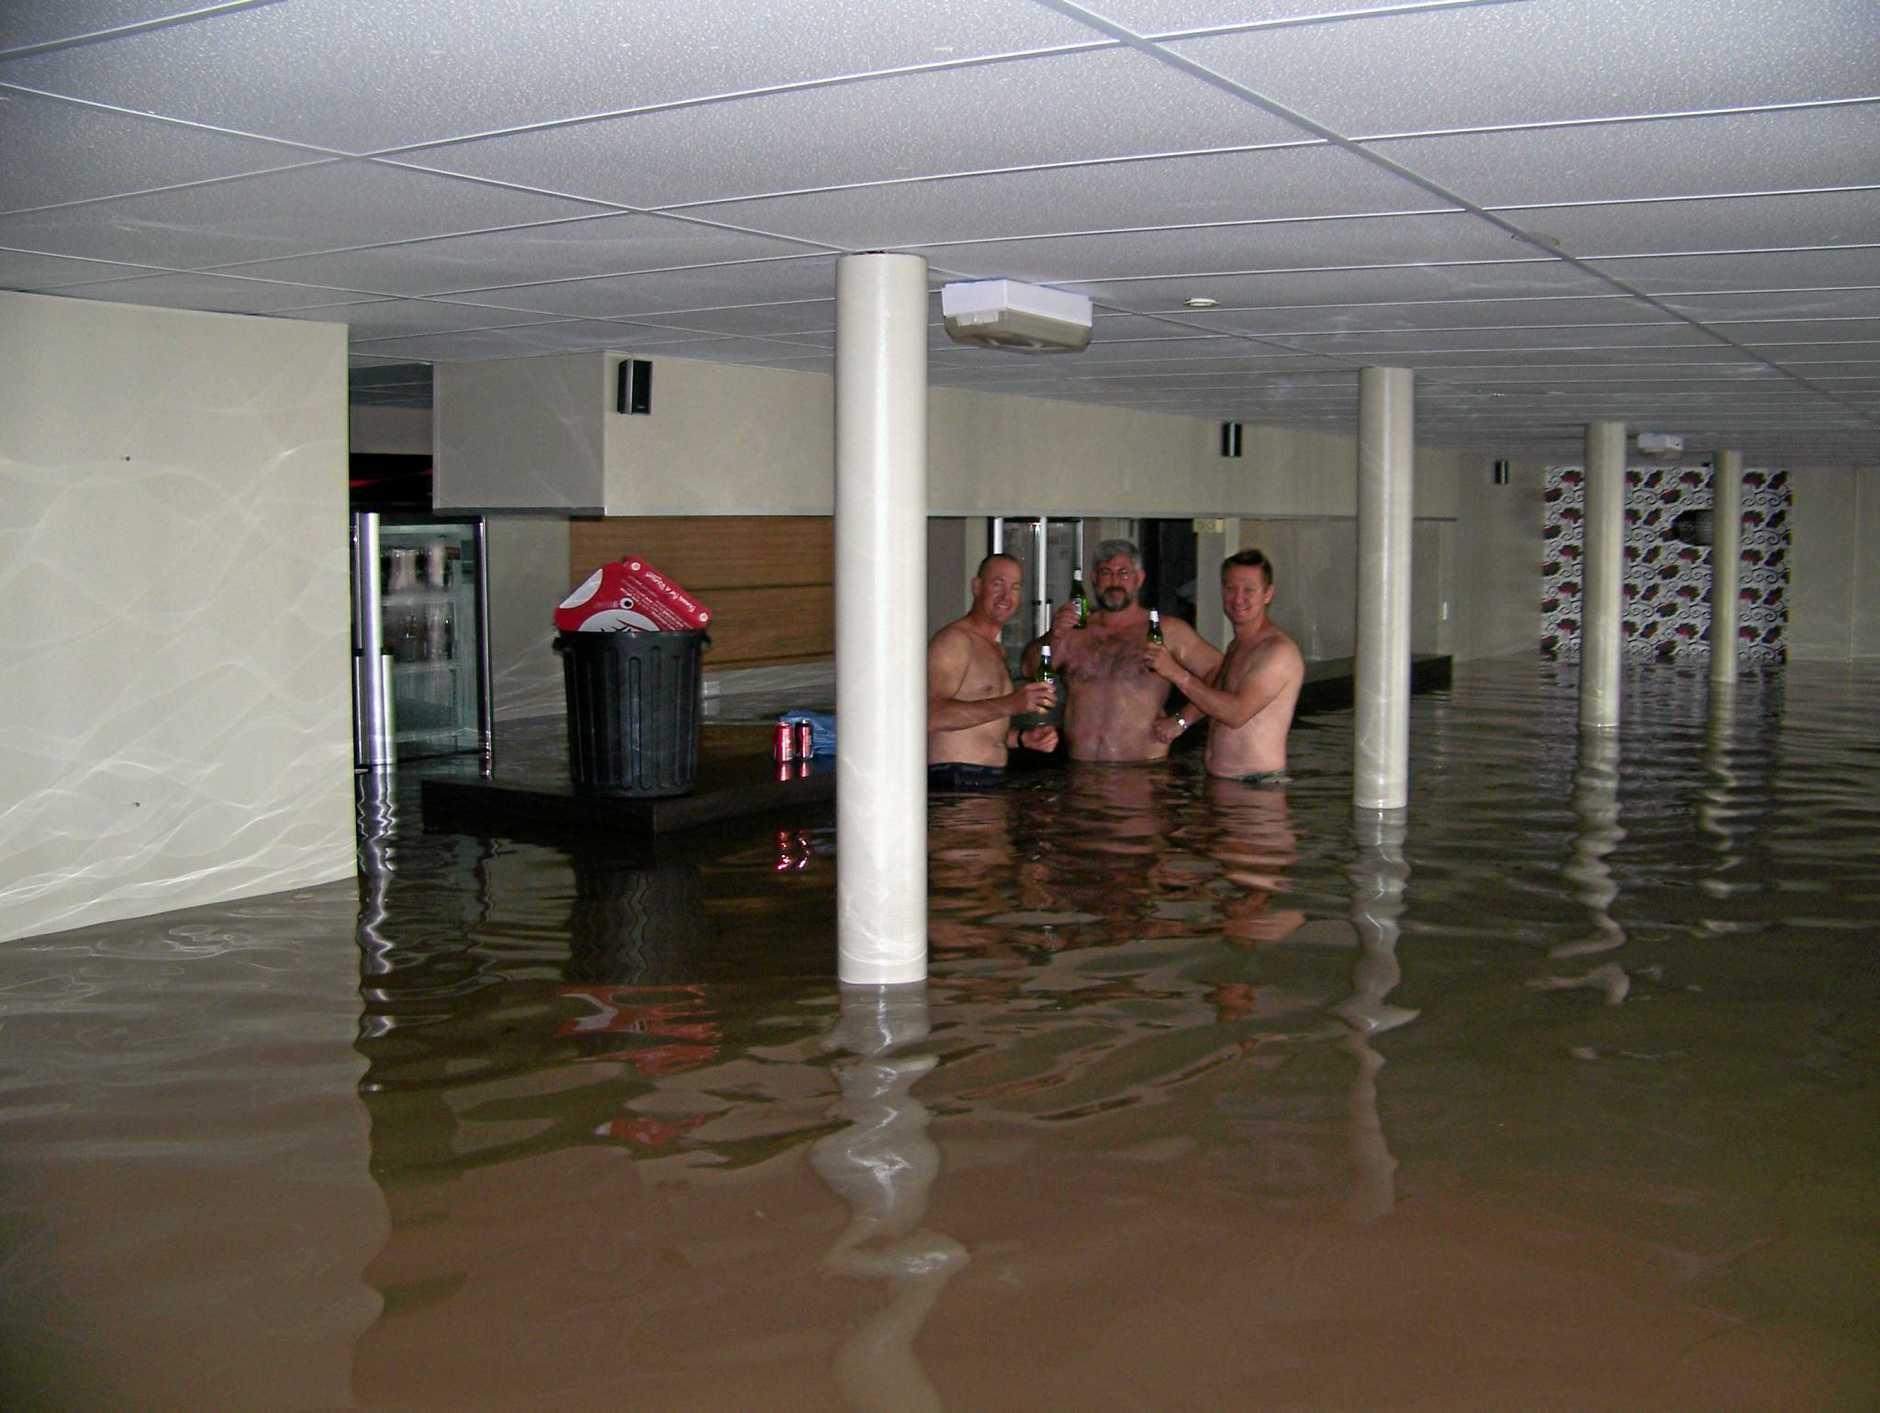 FLOOD BAR BORN: Nigel Jensen, Bruce Dalton and Brett Jensen share a beer at the Spinnaker Bar and Restaurant during the floods.